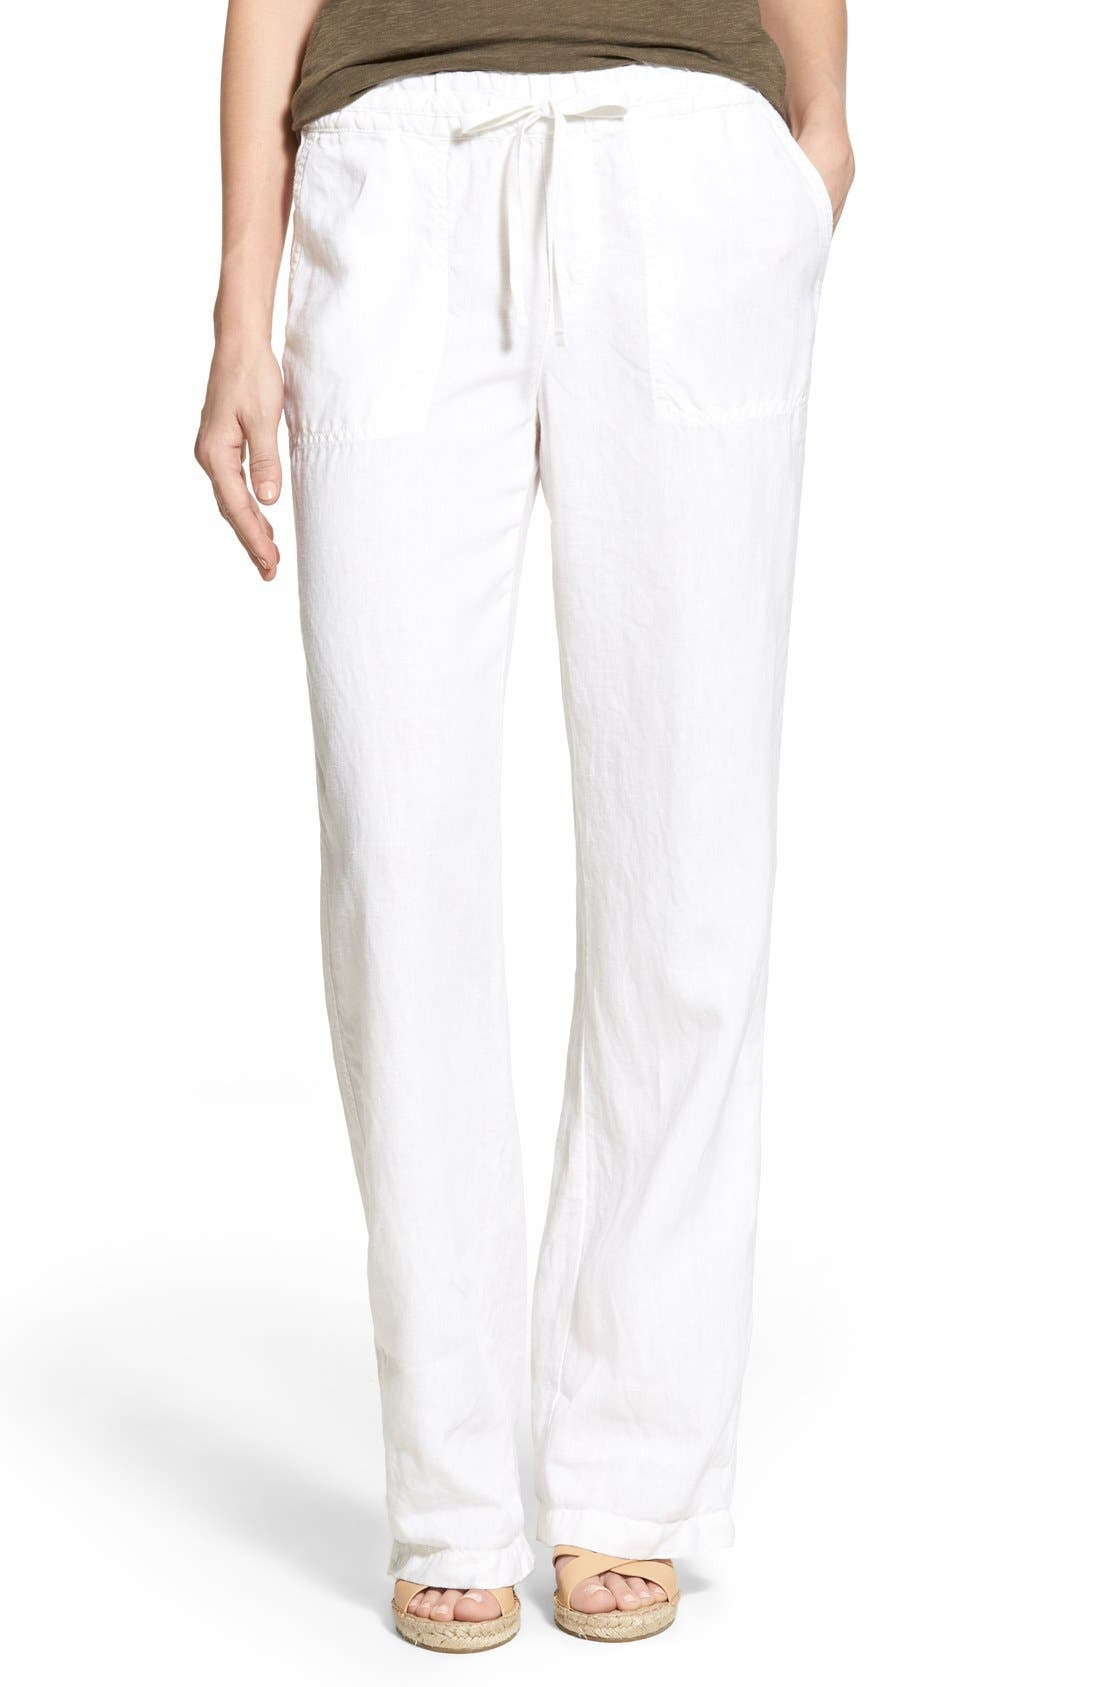 Alternate Image 1 Selected - Caslon® Drawstring Linen Pants (Regular & Petite)